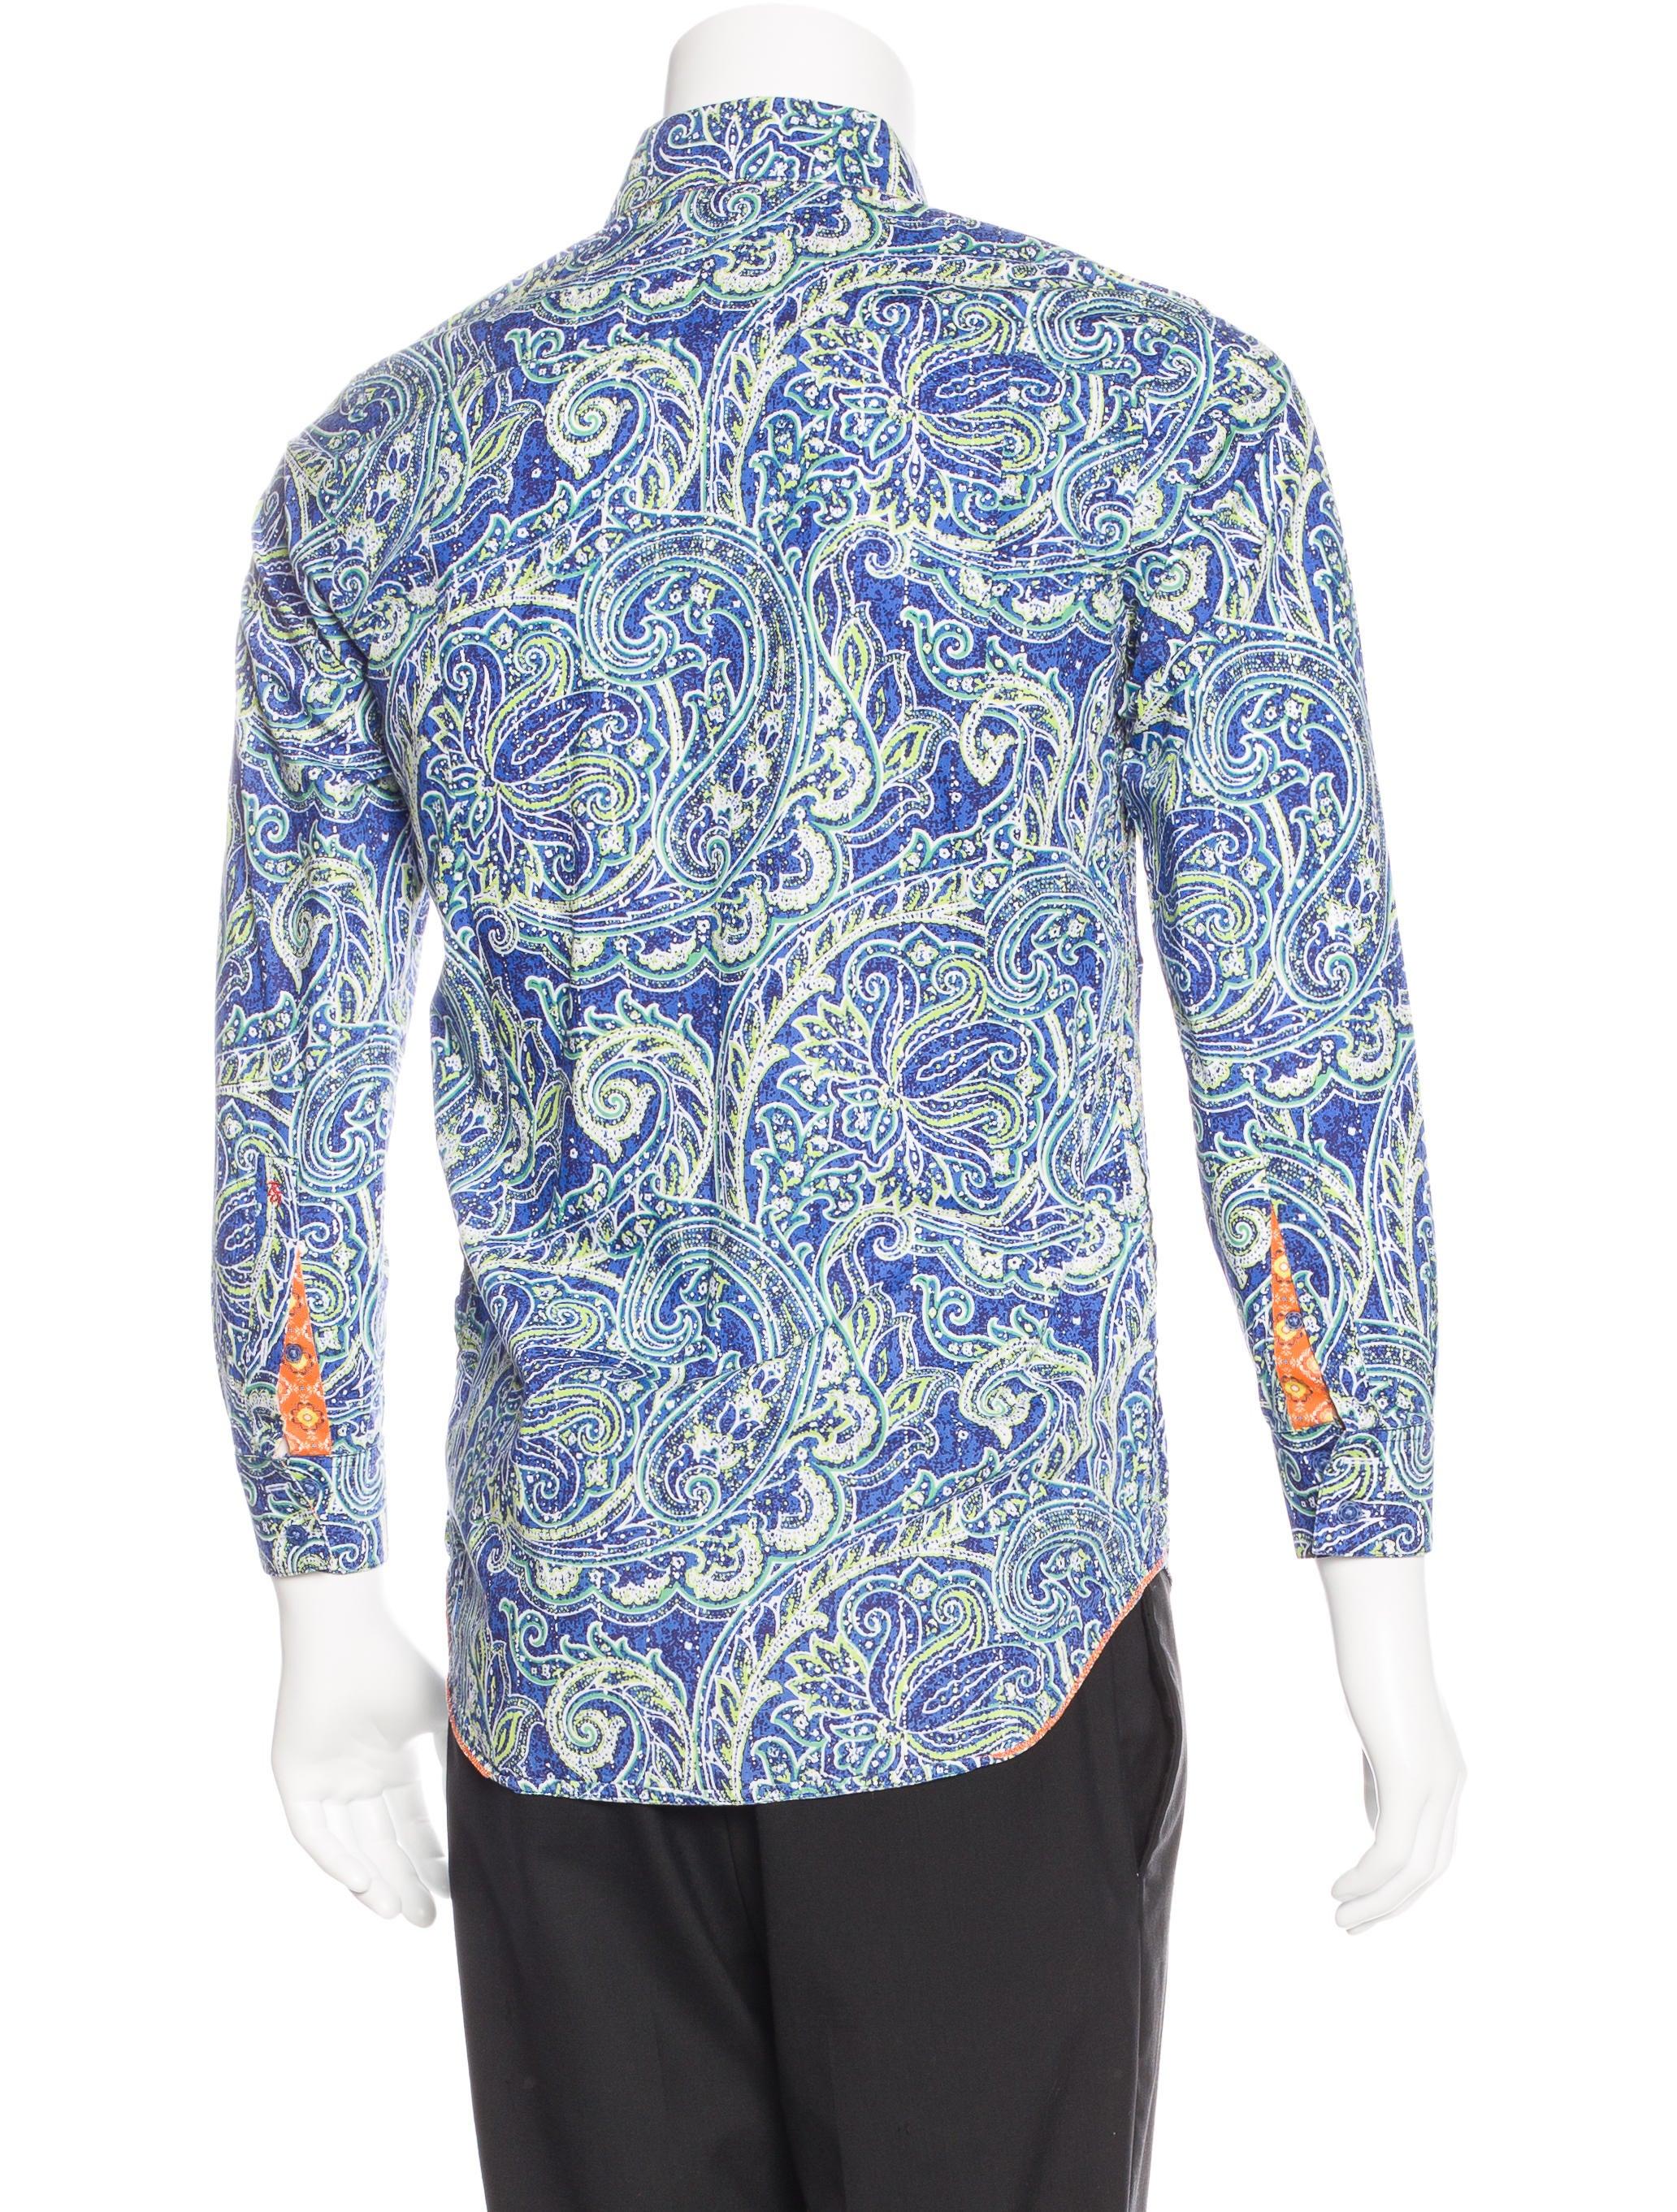 Designer Shirts Like Robert Graham